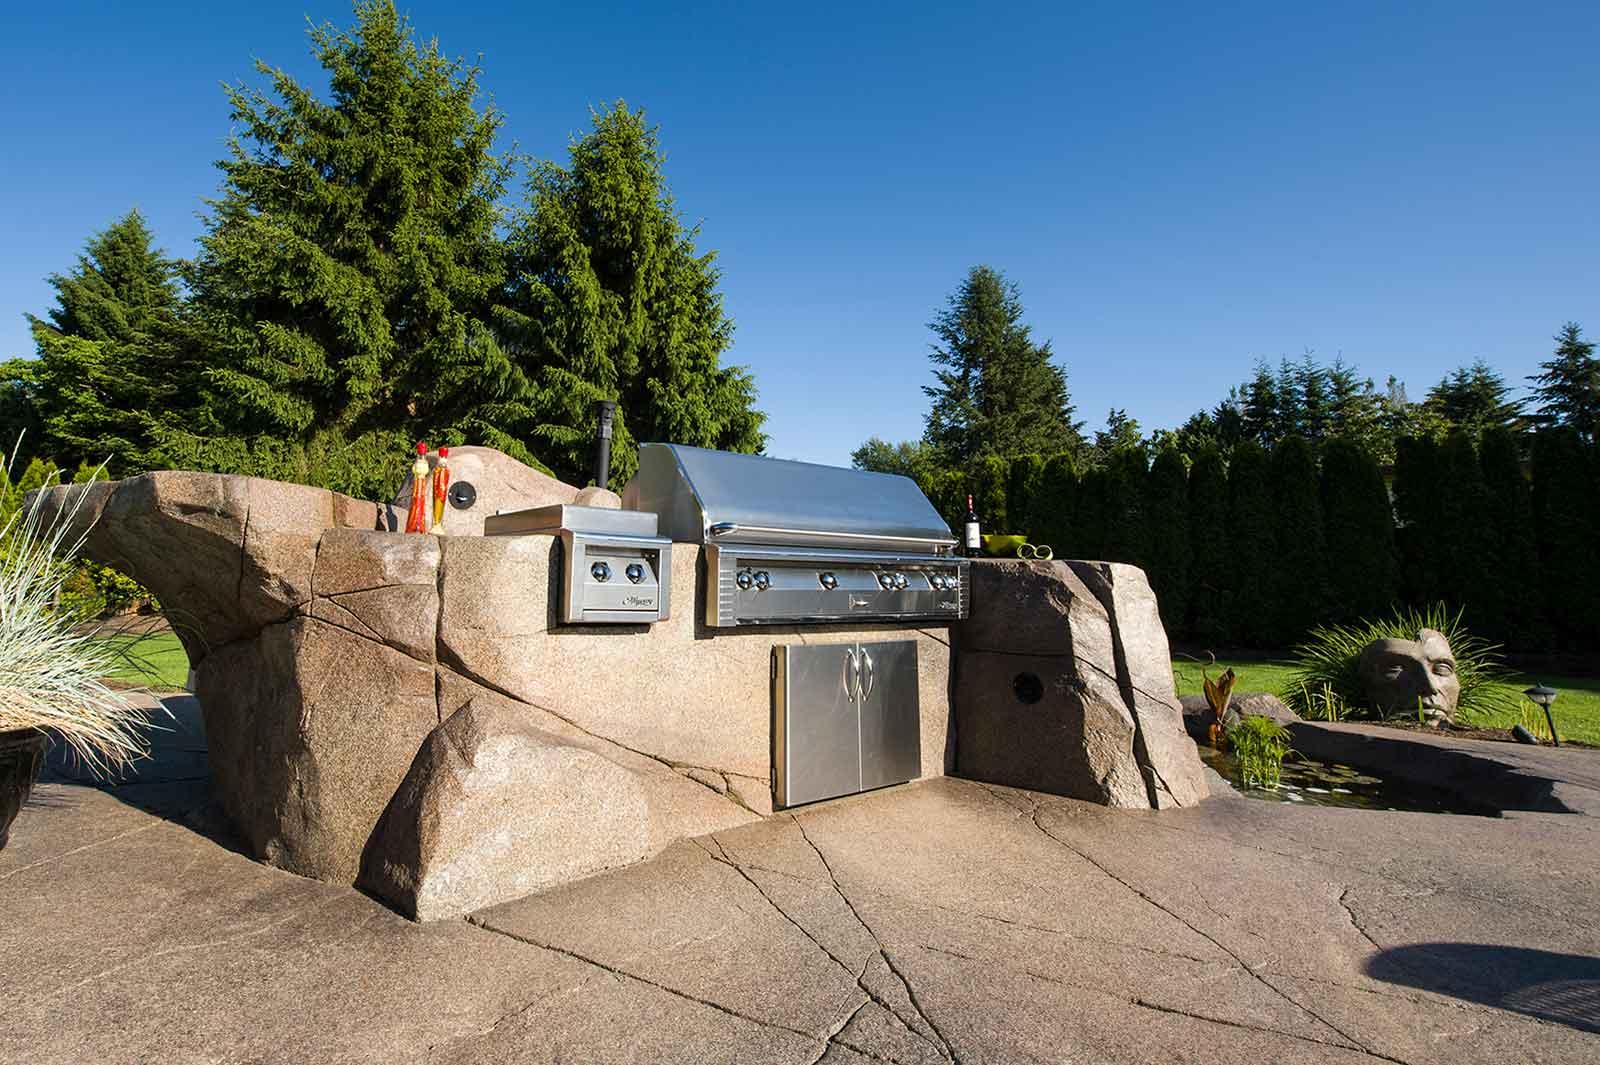 Custom concrete paving around built-in outdoor barbeque